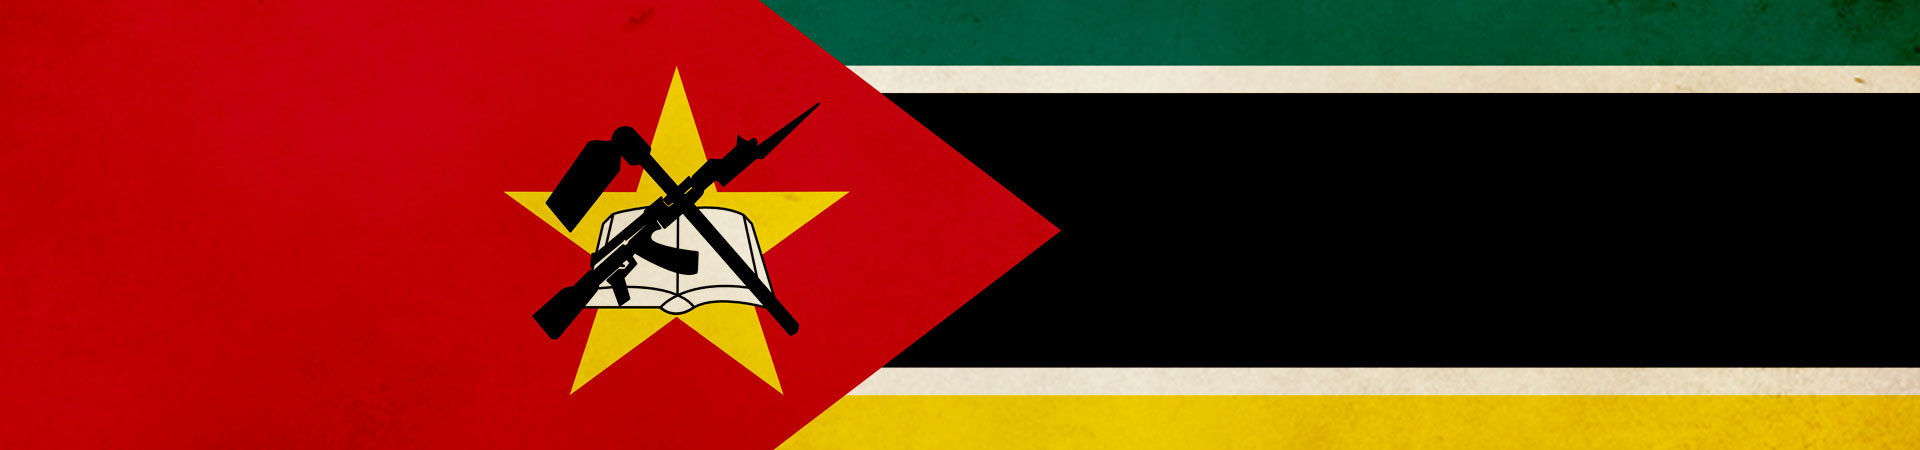 Moçambique Série III